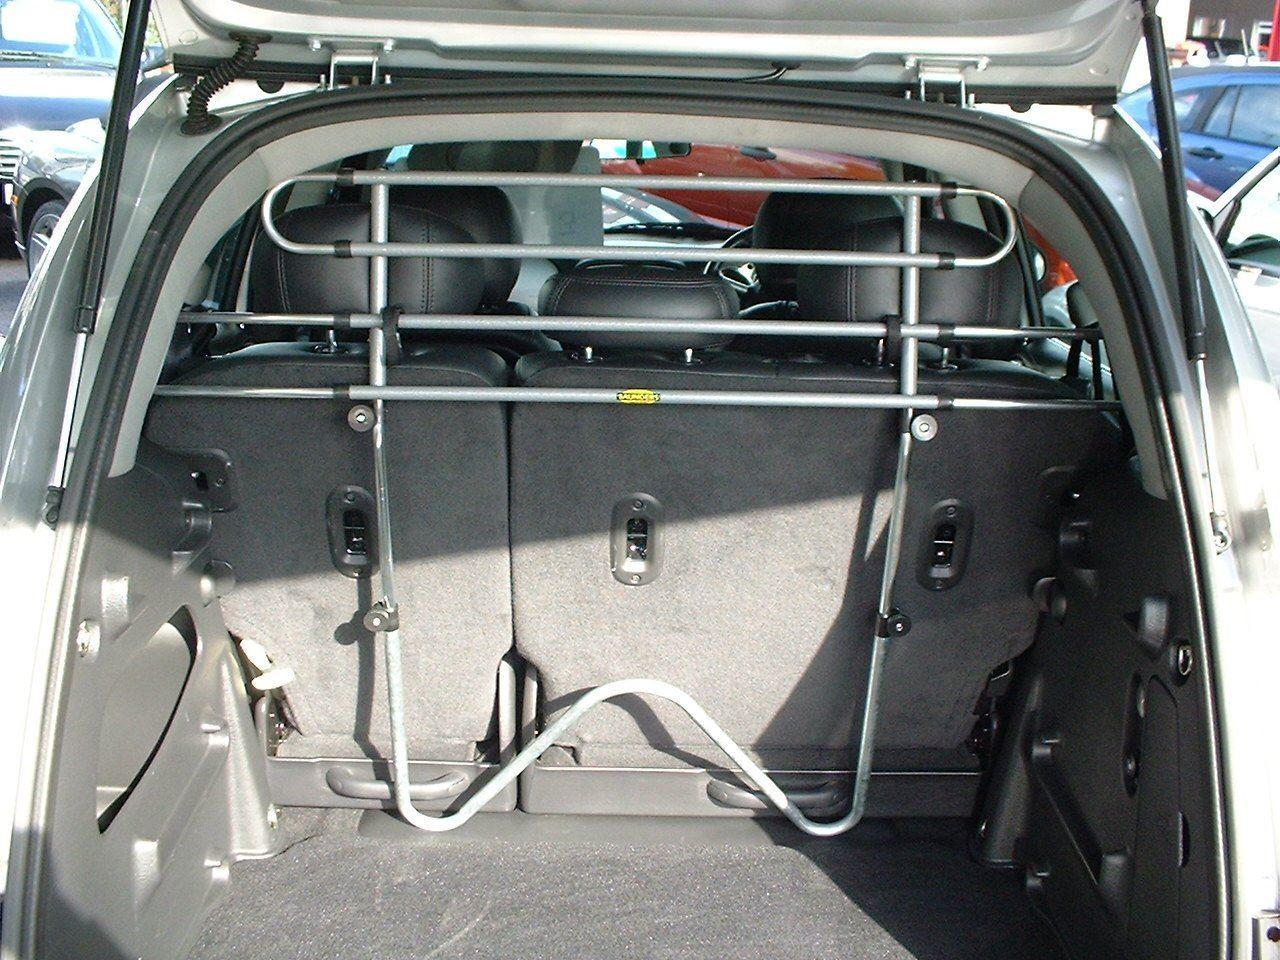 Saunders T94 Dog Guard For Audi A4 Avant Estate / S4 2015 onwards